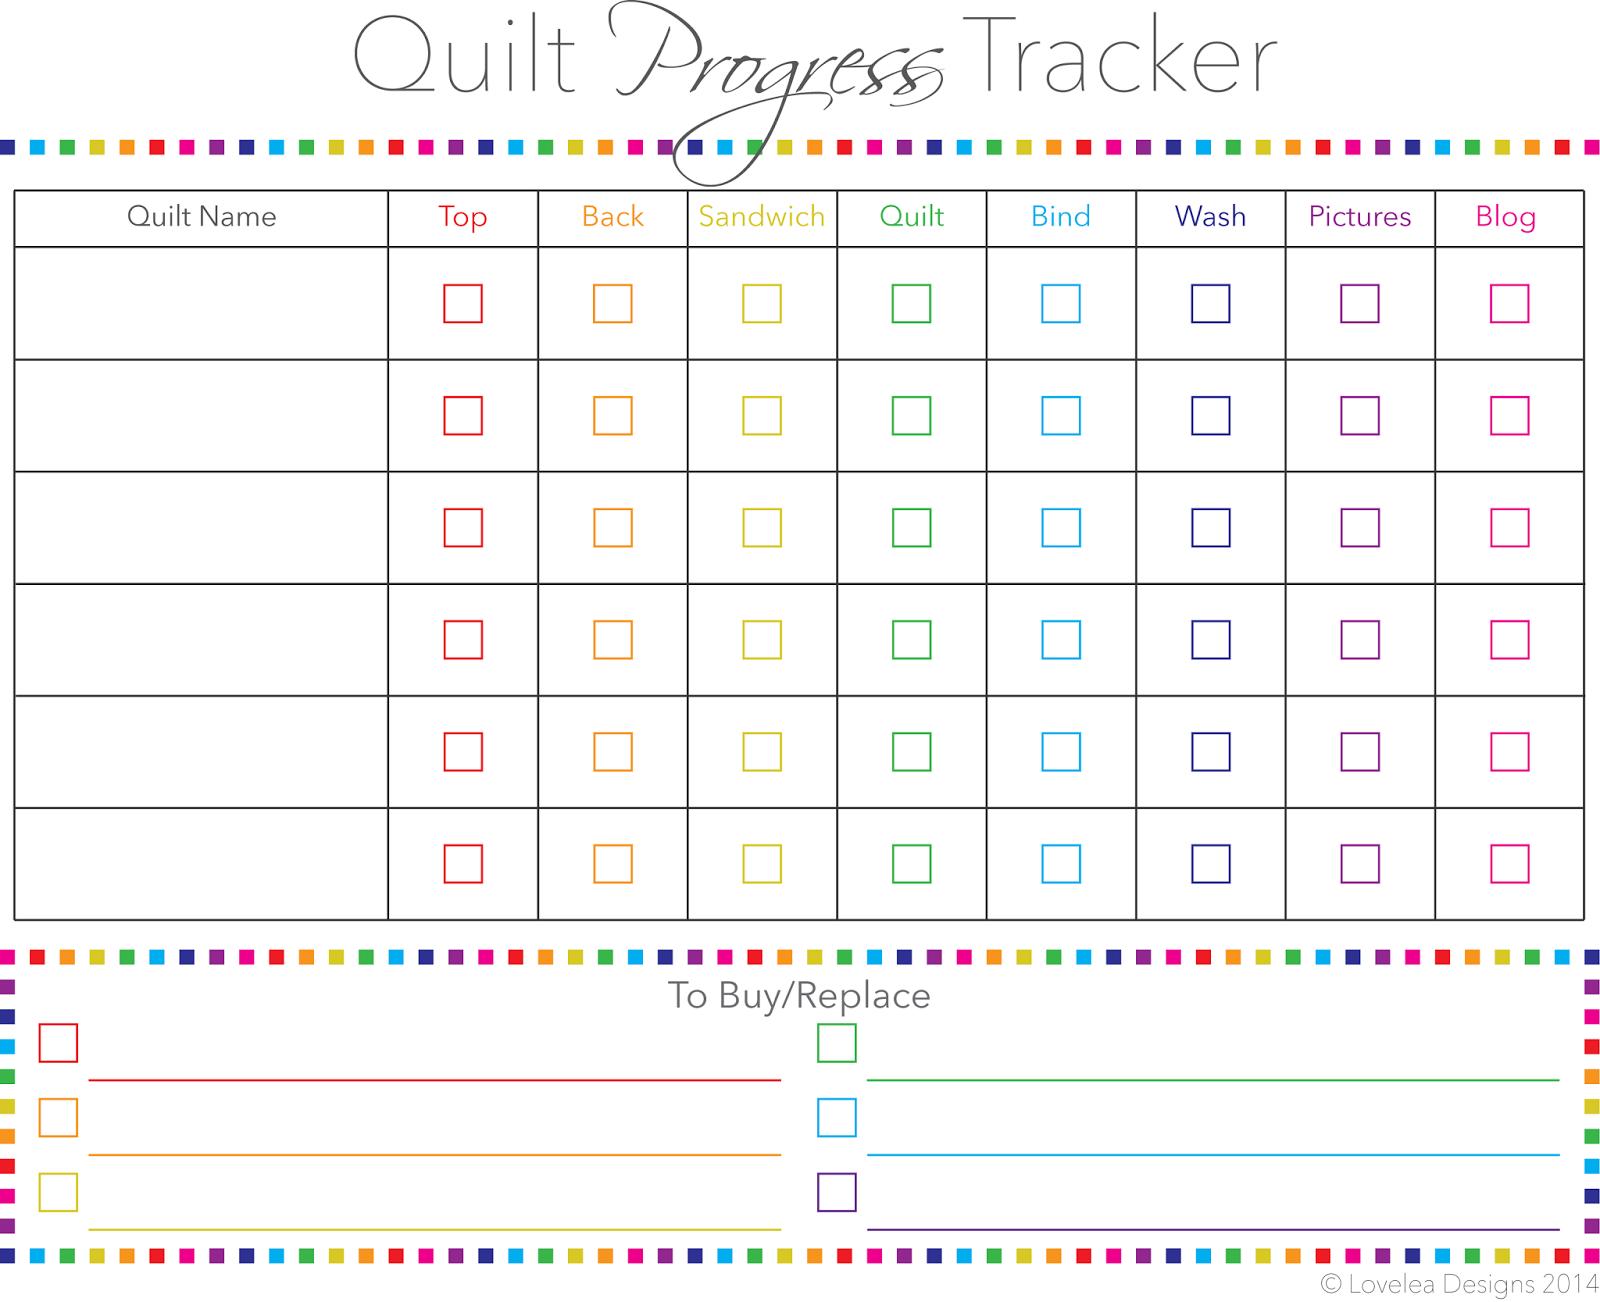 Downloadable Quilt Progress Tracker